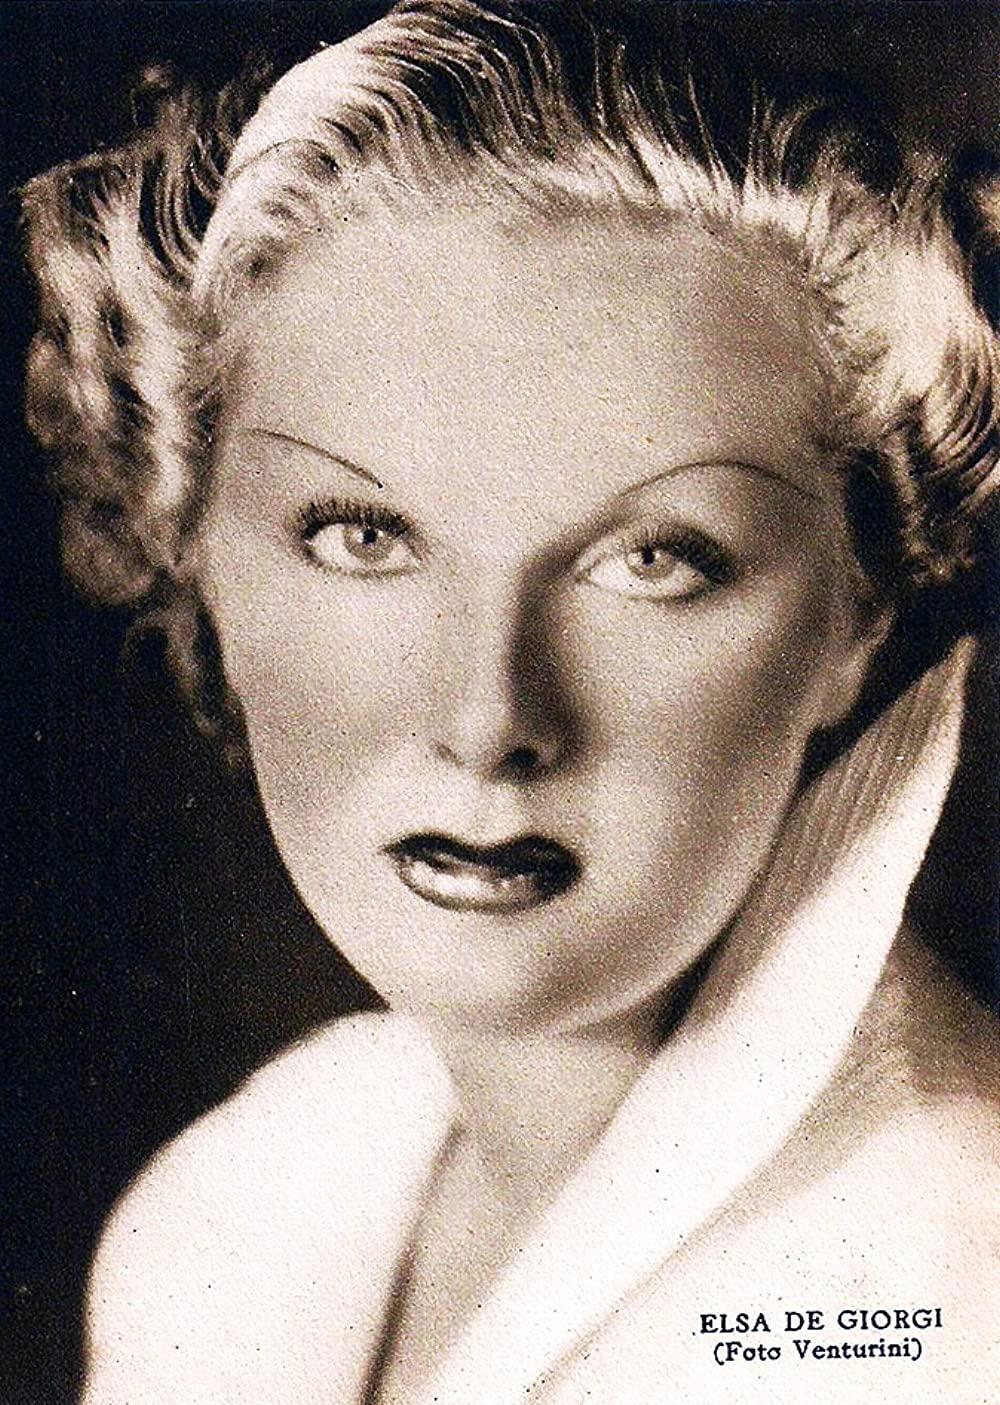 30s 40s italian cinema actress beauty elsa de giorgi fashion history the lux on moda sotto le bombe